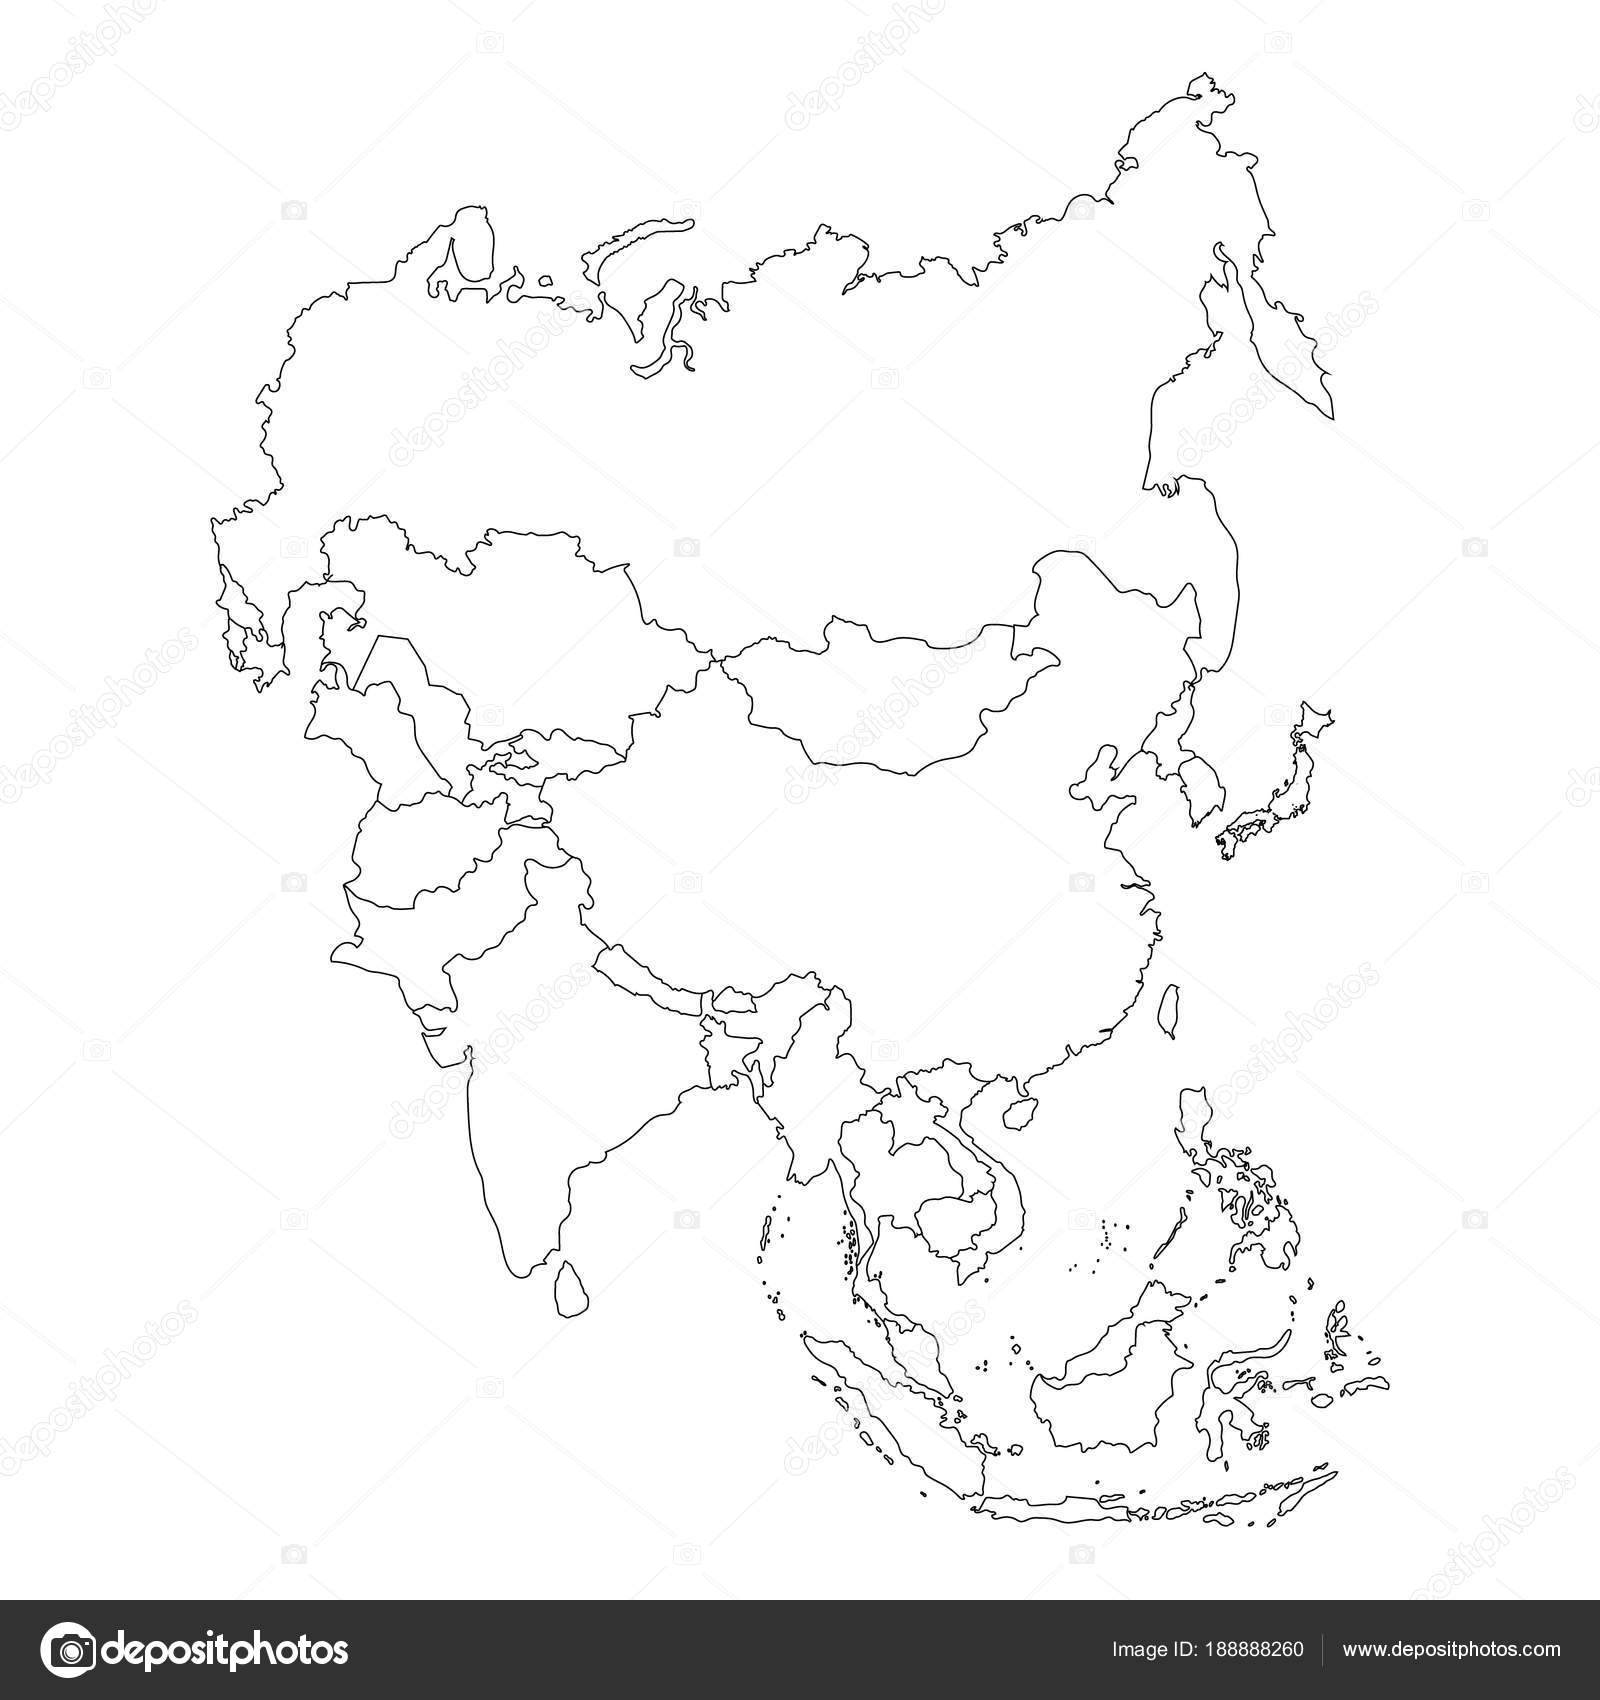 Outline Map Of Asia Continent.Asia Map Raster Stock Photo C Viktorijareut 188888260